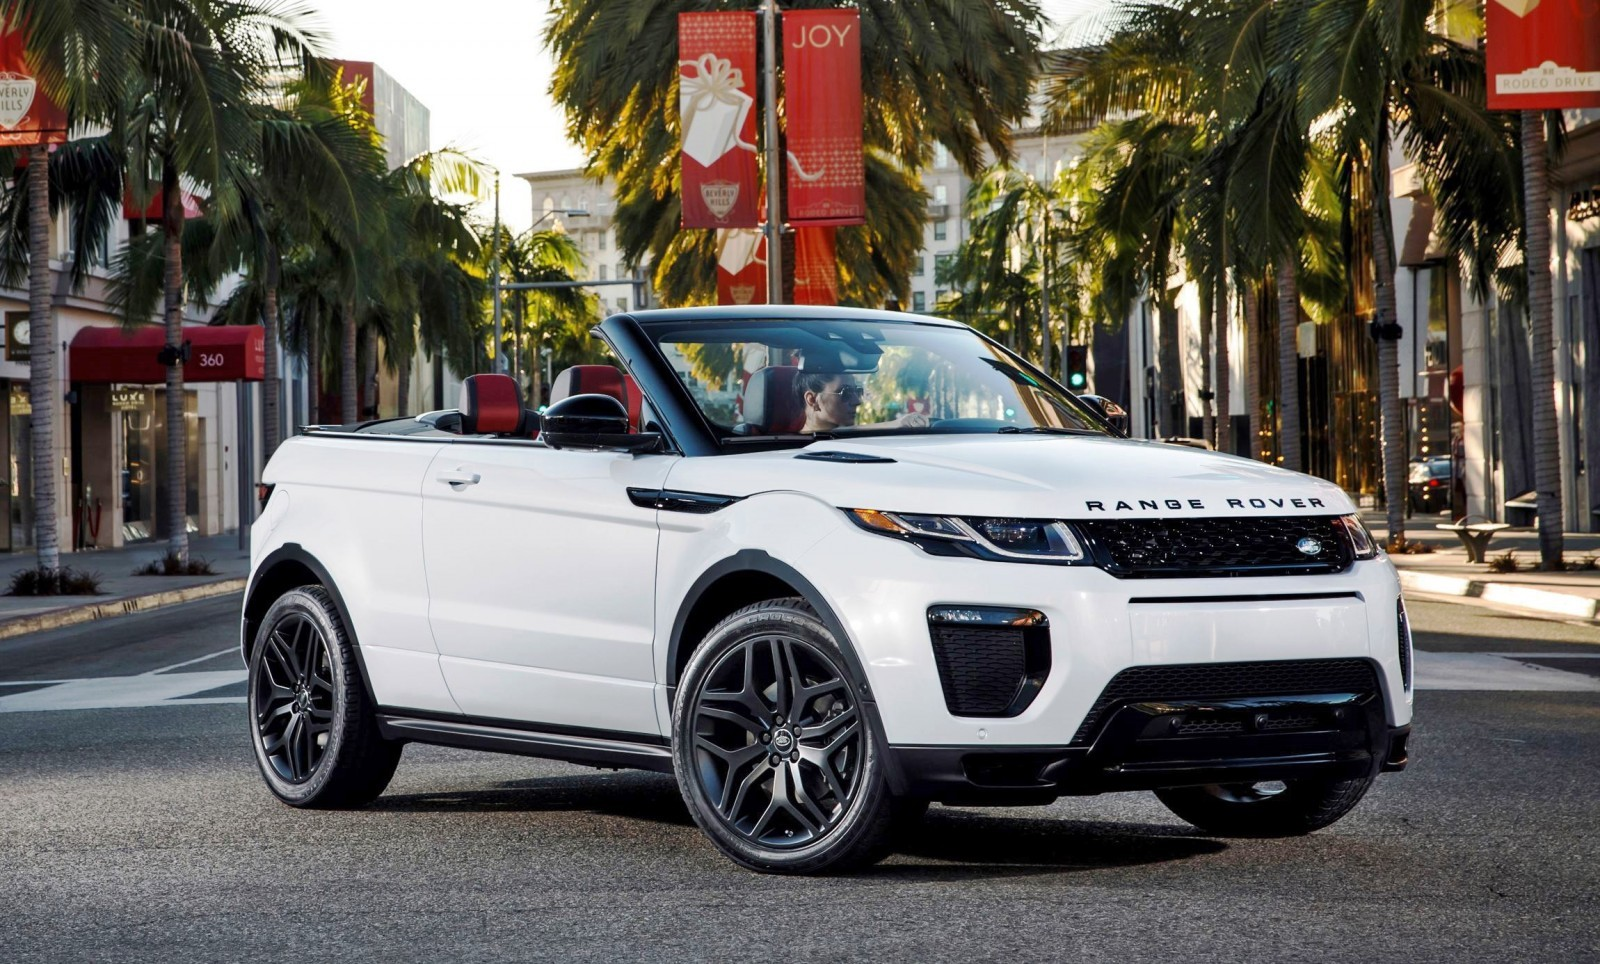 2016 range rover evoque convertible la. Black Bedroom Furniture Sets. Home Design Ideas